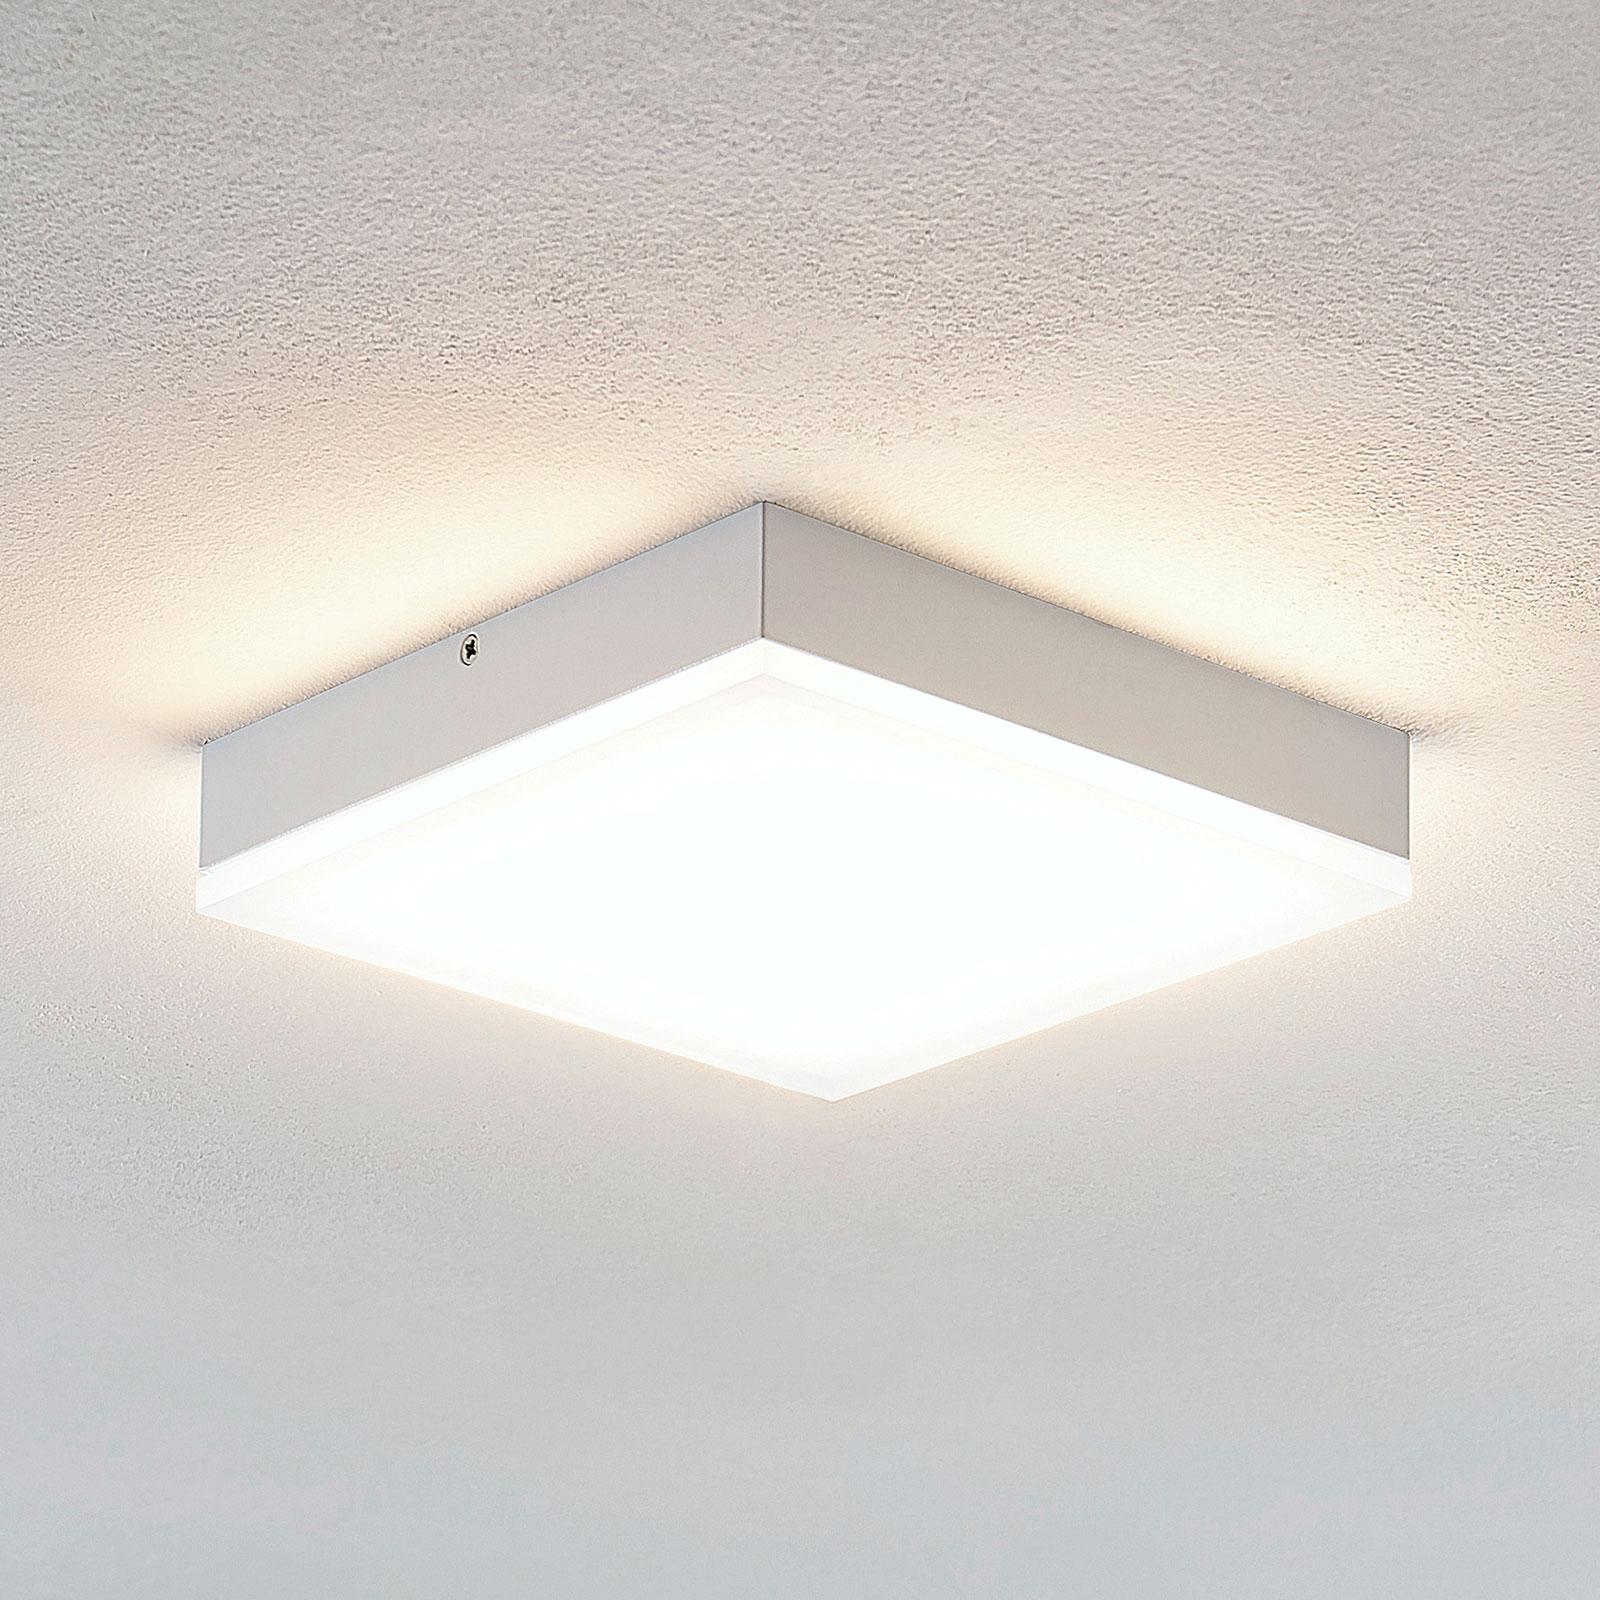 Lindby Tamito lampa sufitowa LED, biała, 20 cm